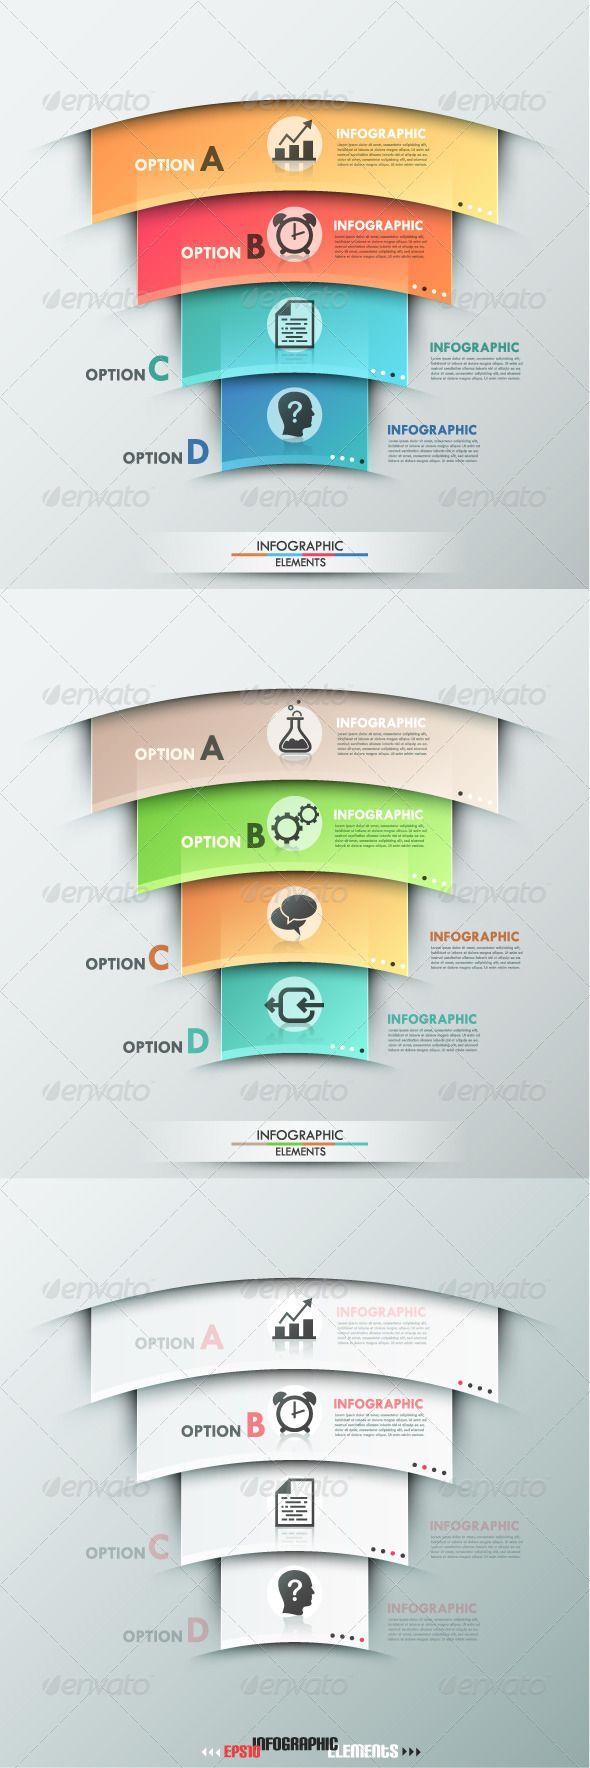 Modern Infographic Options Banner (Three Versions) Tempalte #design Download: http://graphicriver.net/item/modern-infographic-options-banner-three-versions/8257528?ref=ksioks